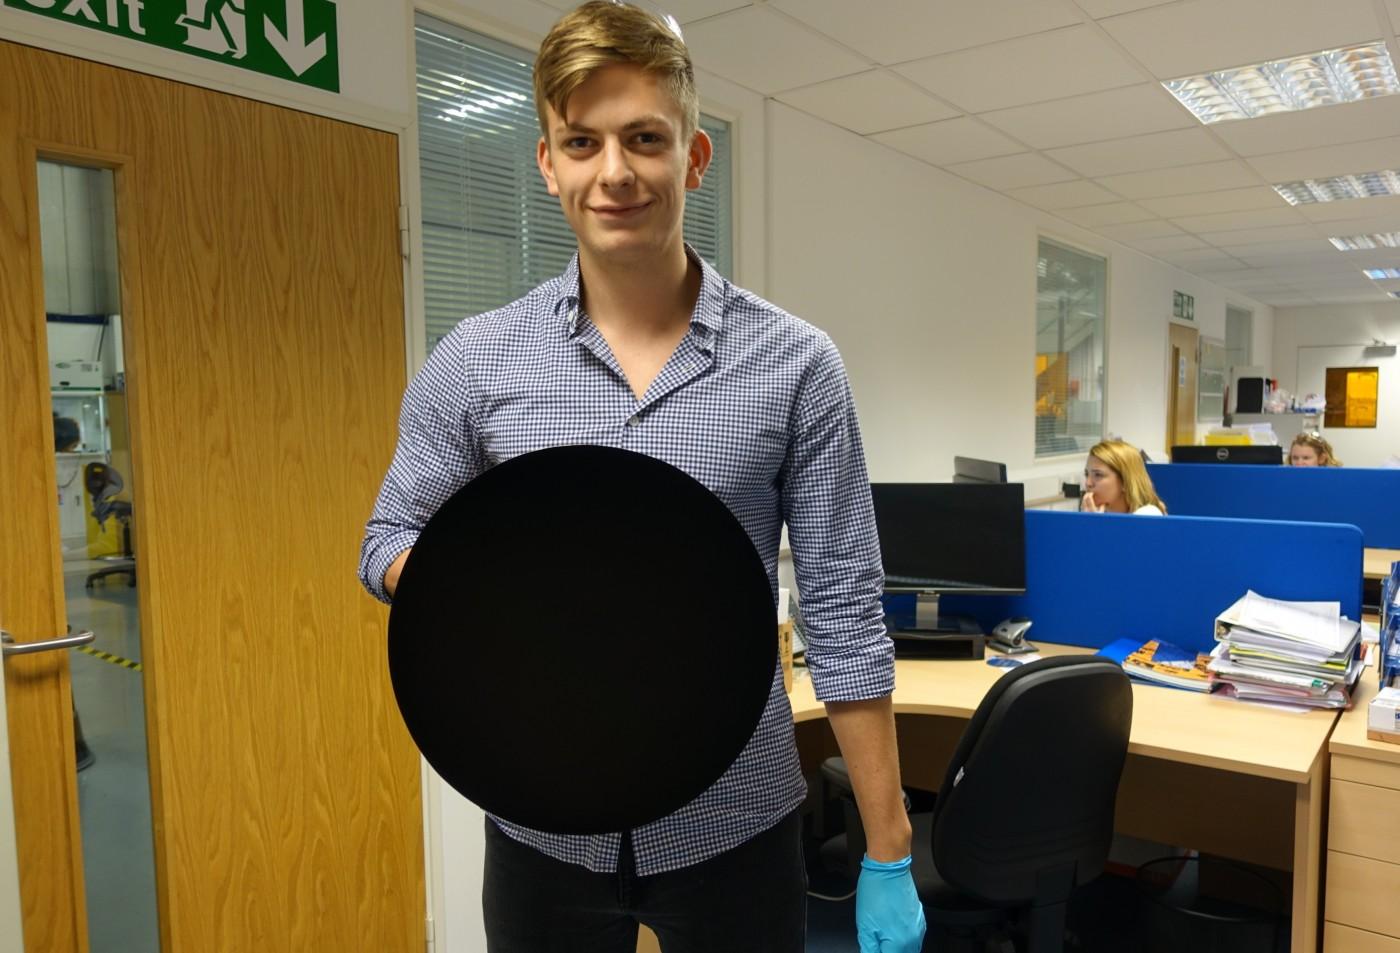 new version of vantablack coating even blacker than original